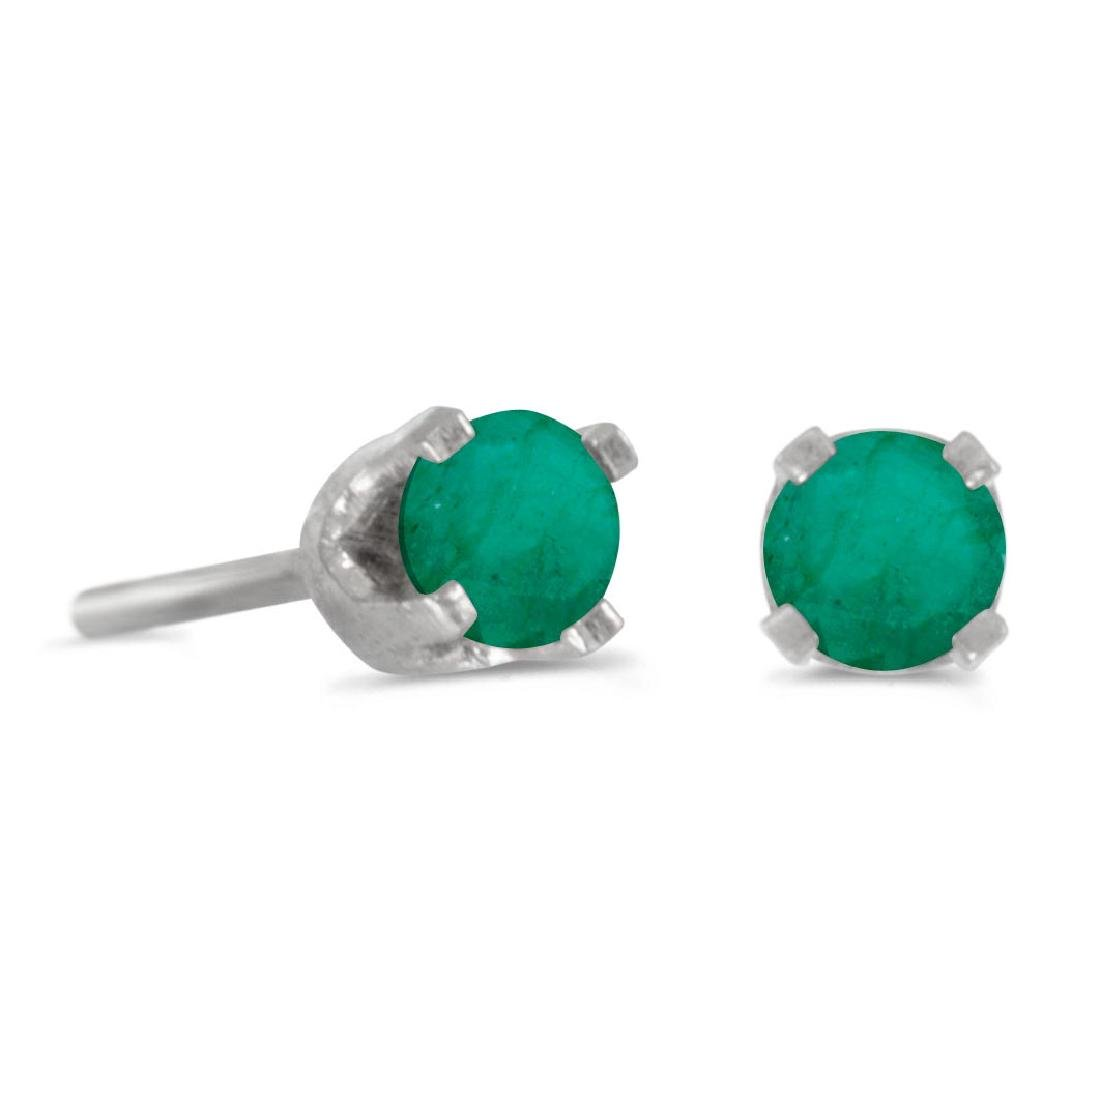 Certified 3 mm Petite Round Genuine Emerald Stud Earrin